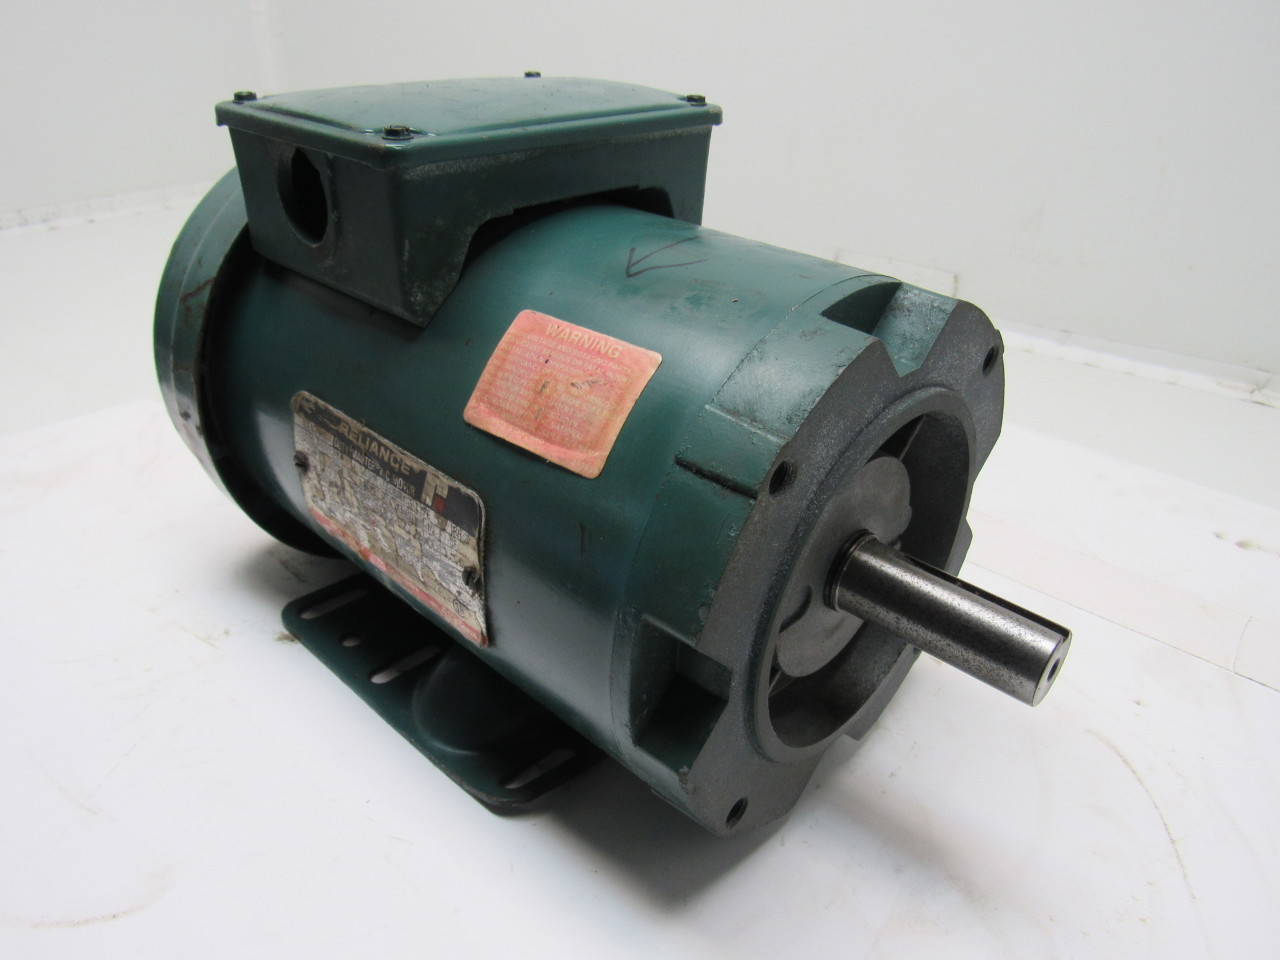 Reliance fj145tc 3 4 hp duty master ac motor 230 460 60 hz for Duty master ac motor